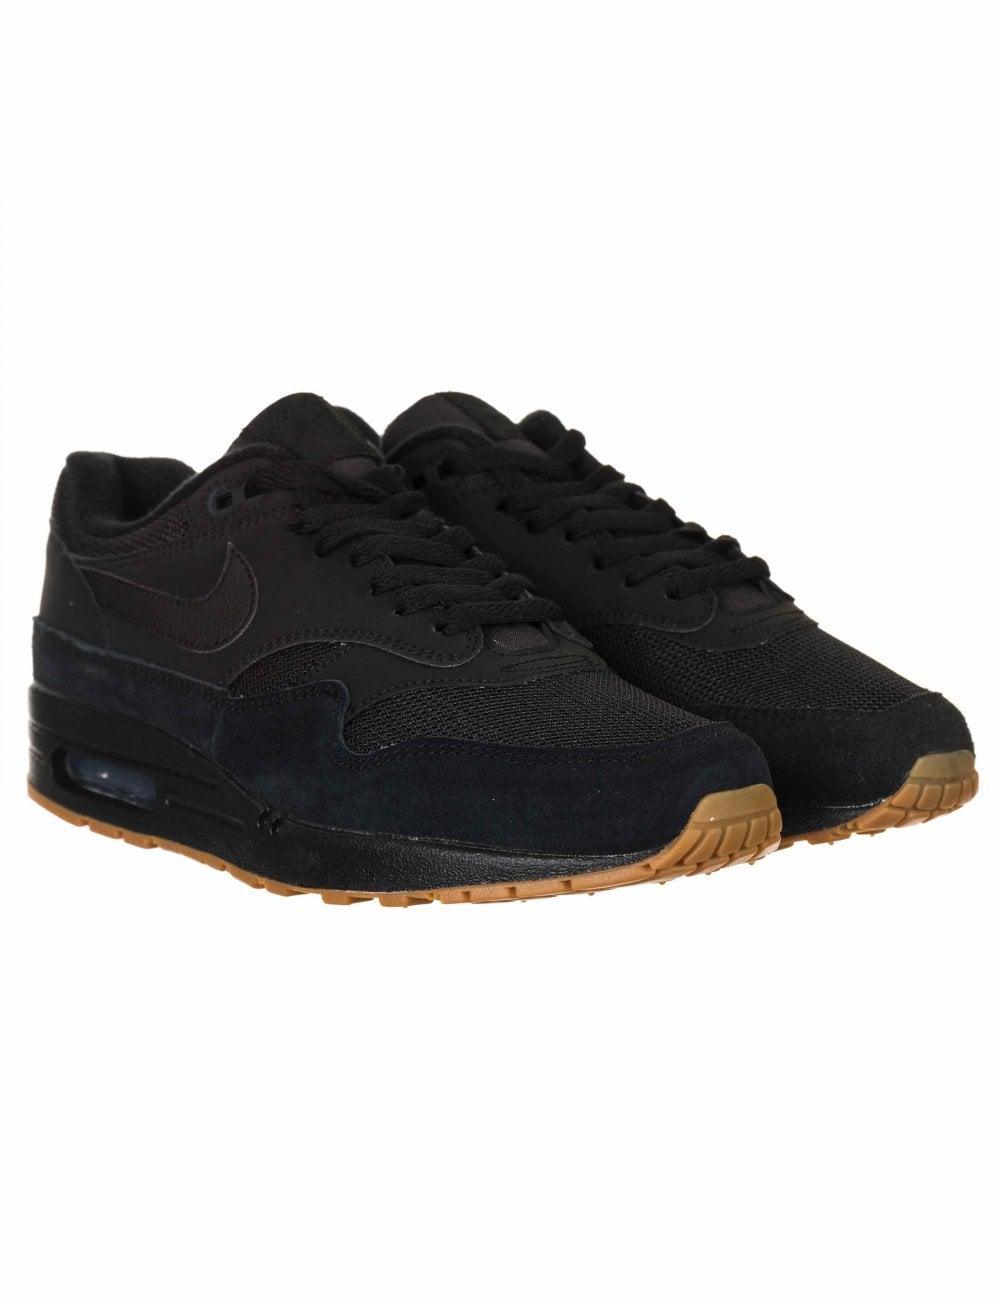 Nike Air Max 1 Trainers - Black/Black